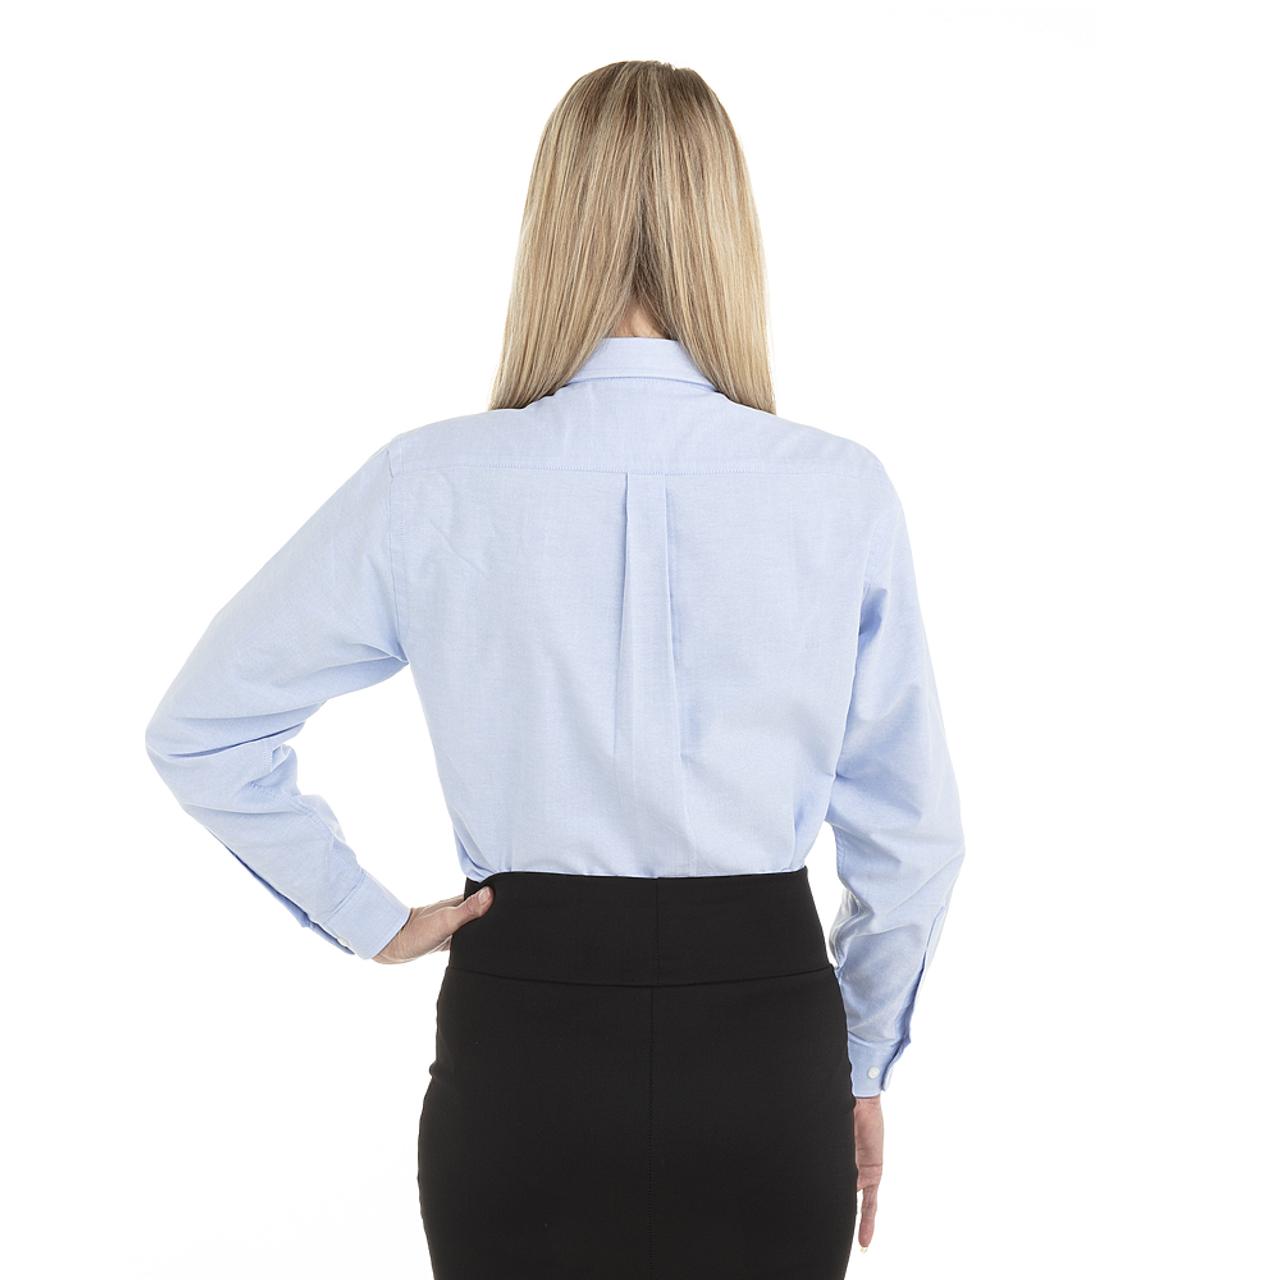 Blue - Back, 18CV300 Van Heusen Ladies' Long Sleeve Oxford Shirt | T-shirt.ca